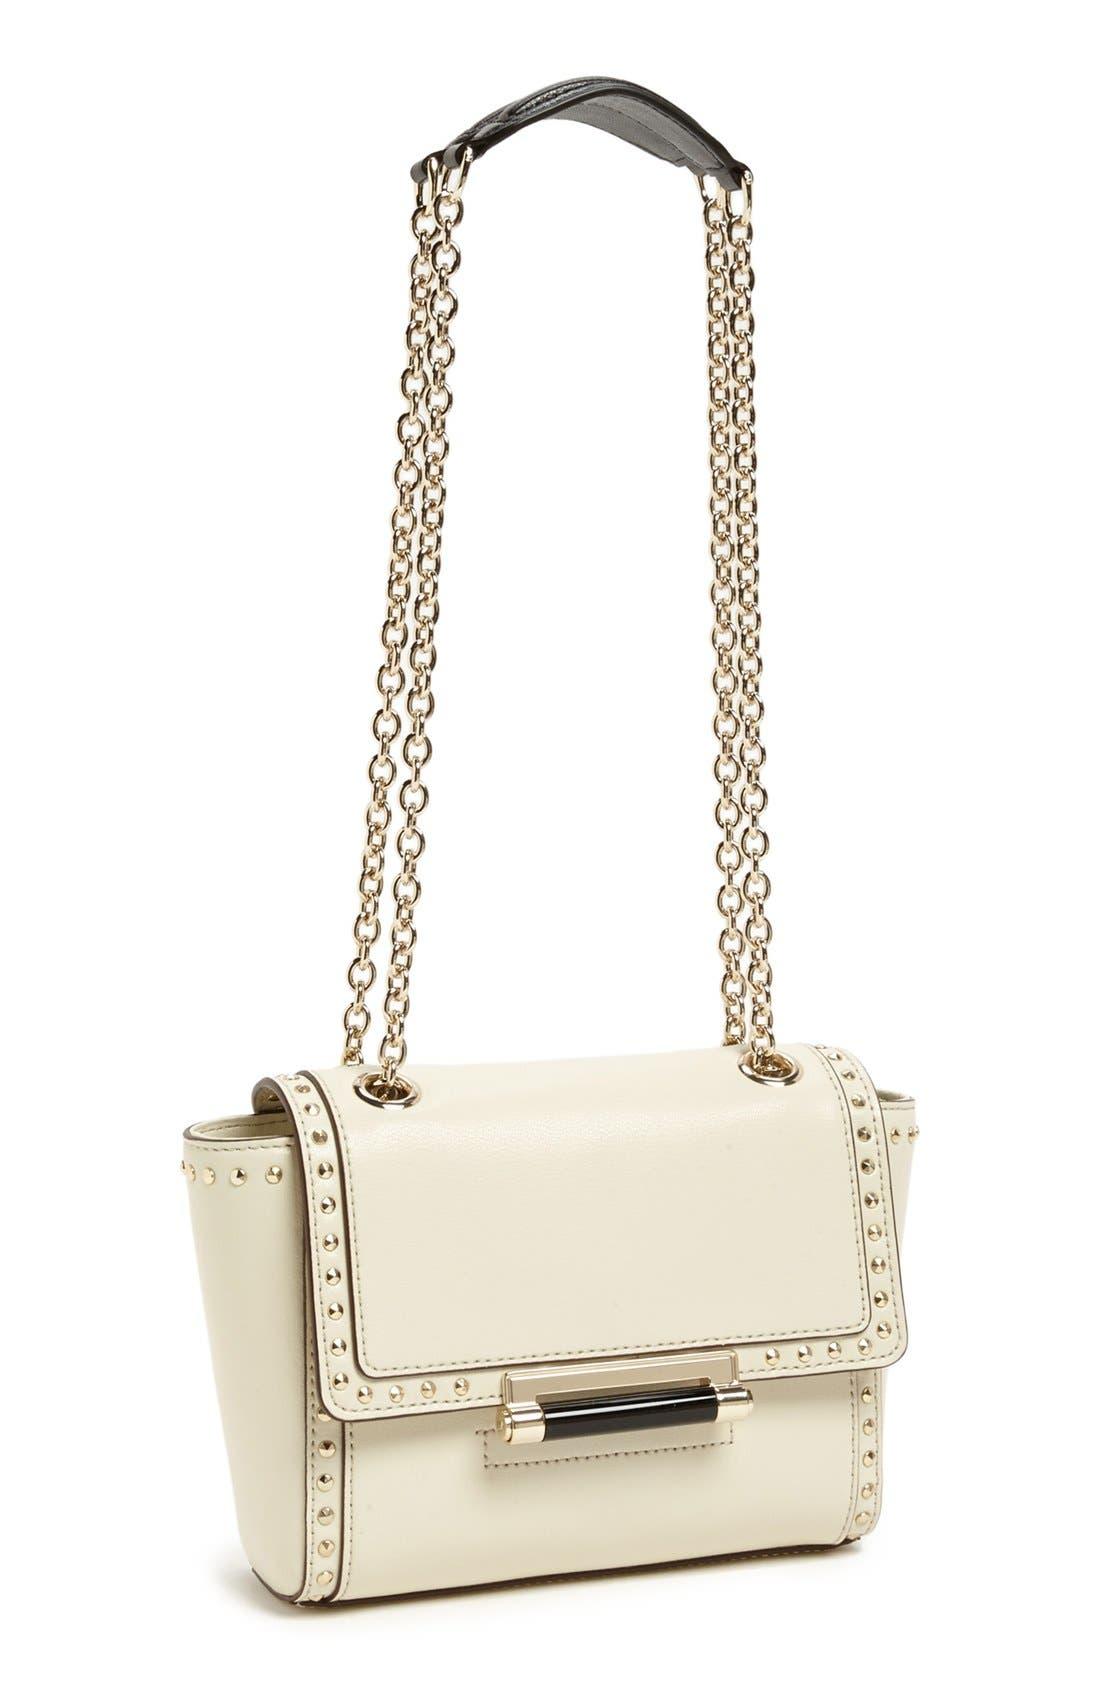 Main Image - Diane von Furstenberg '440 - Mini' Studded Crossbody Bag